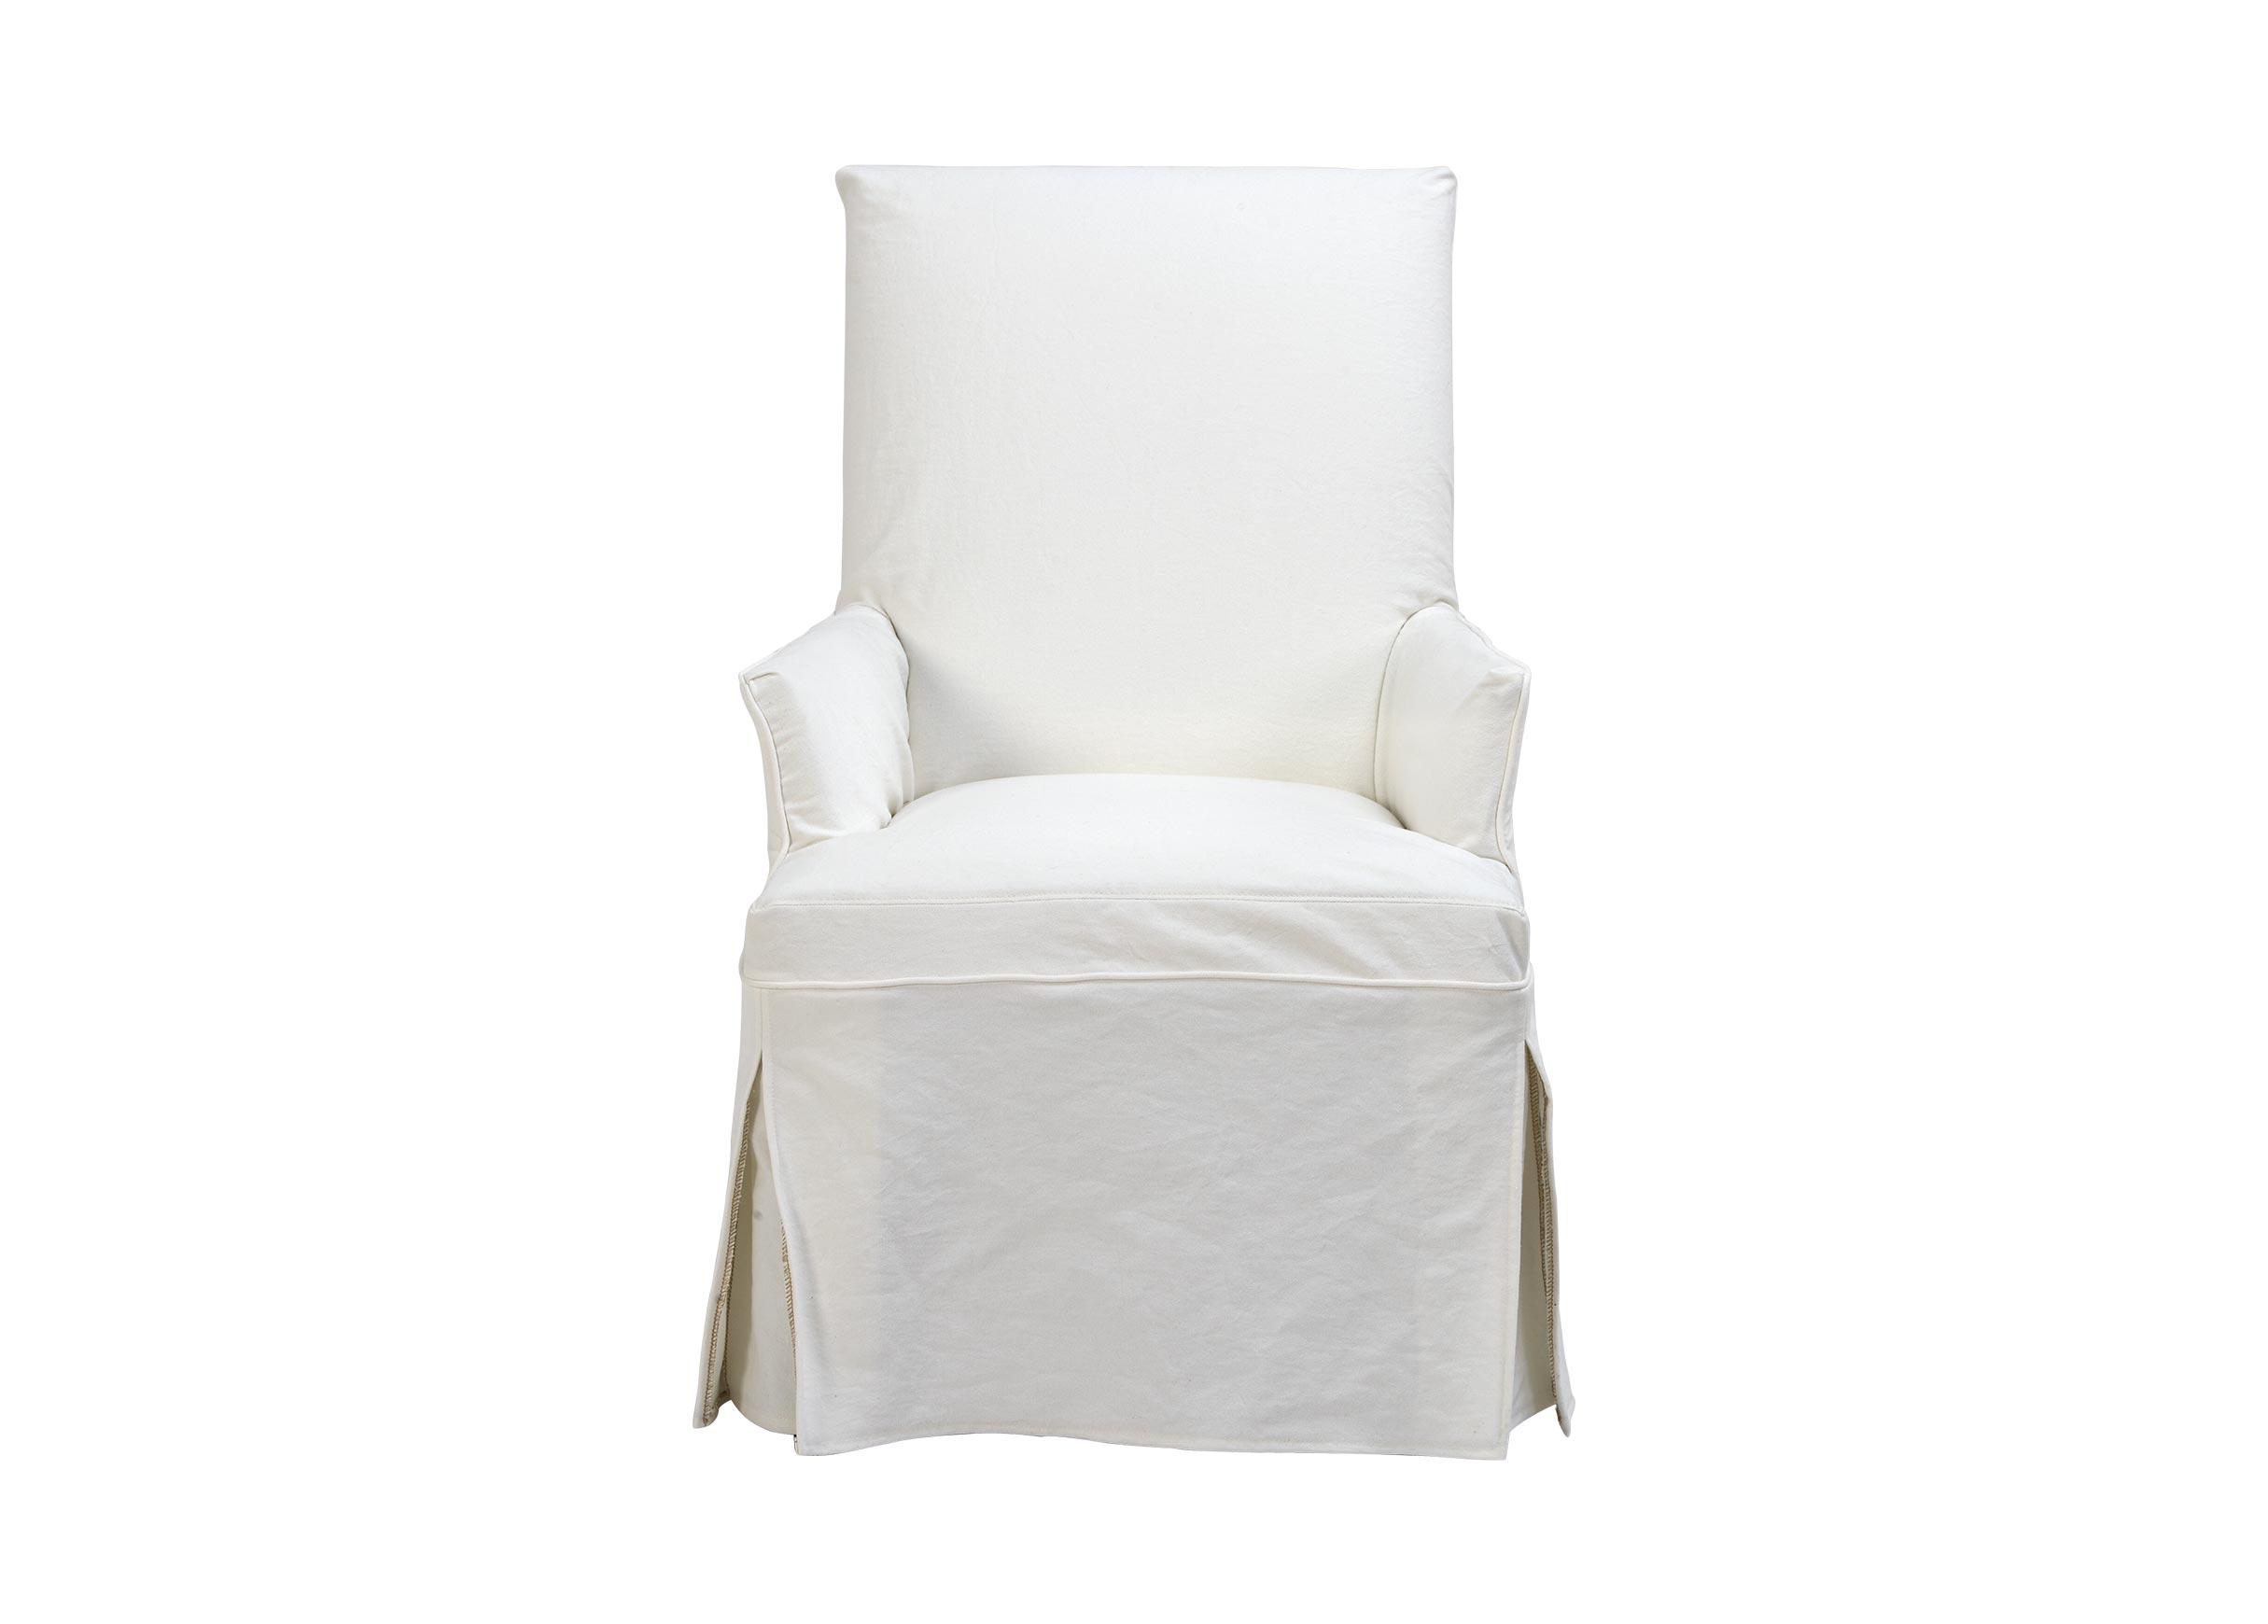 Dayton Slipcovered Chair